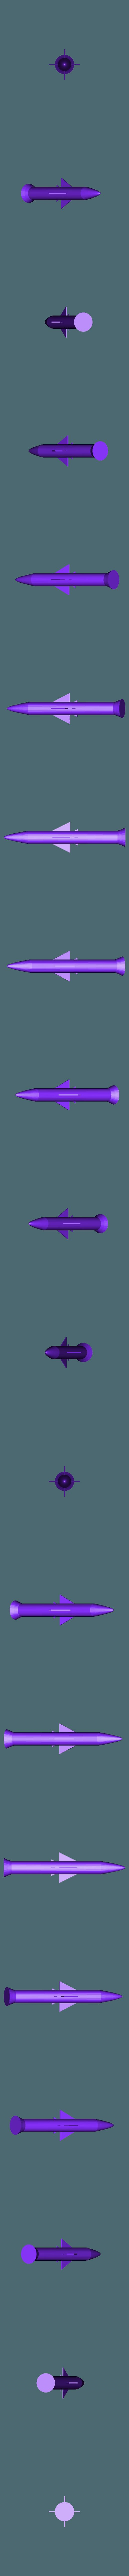 Soviet Anti-Ship Missile v3.obj Download free OBJ file Russian Missile Baston-p p-800 Оникс (onyx) • 3D printable object, andyblinkblink